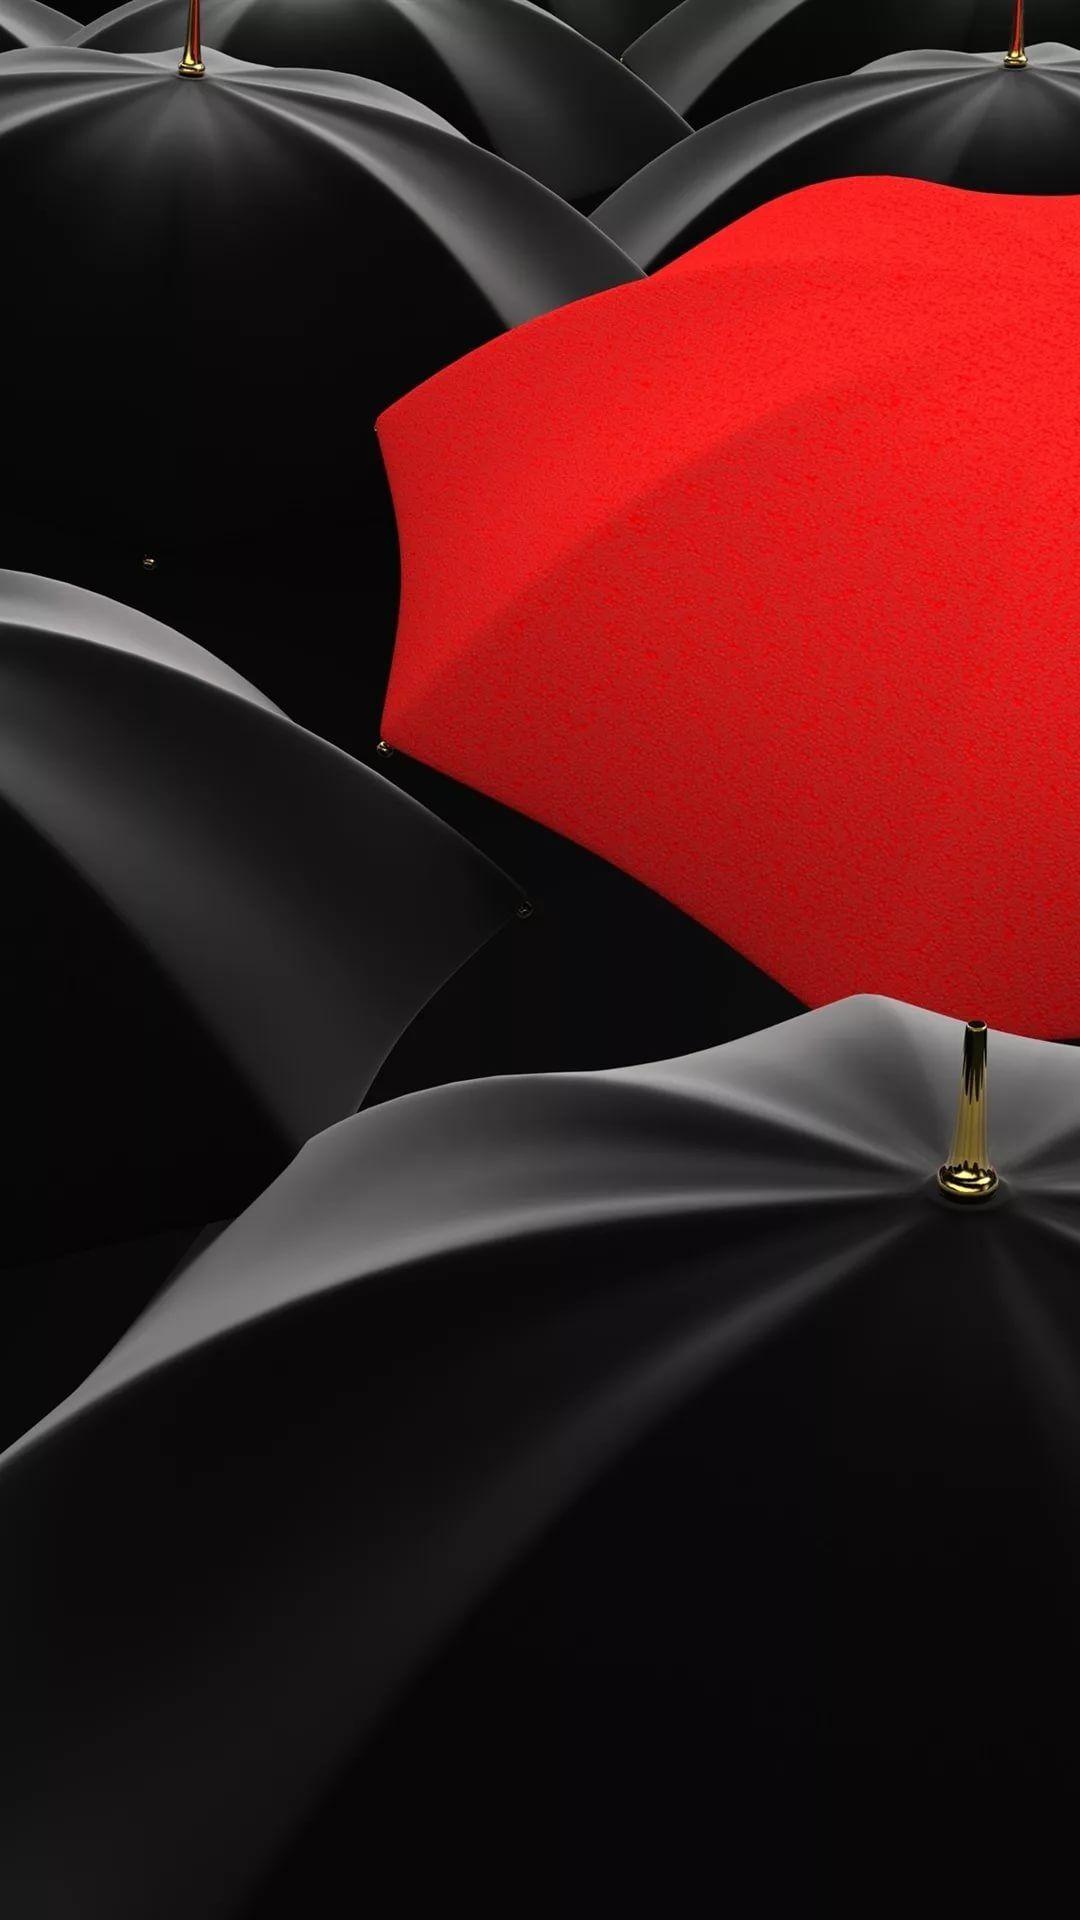 Black Red iPhone 6 wallpaper